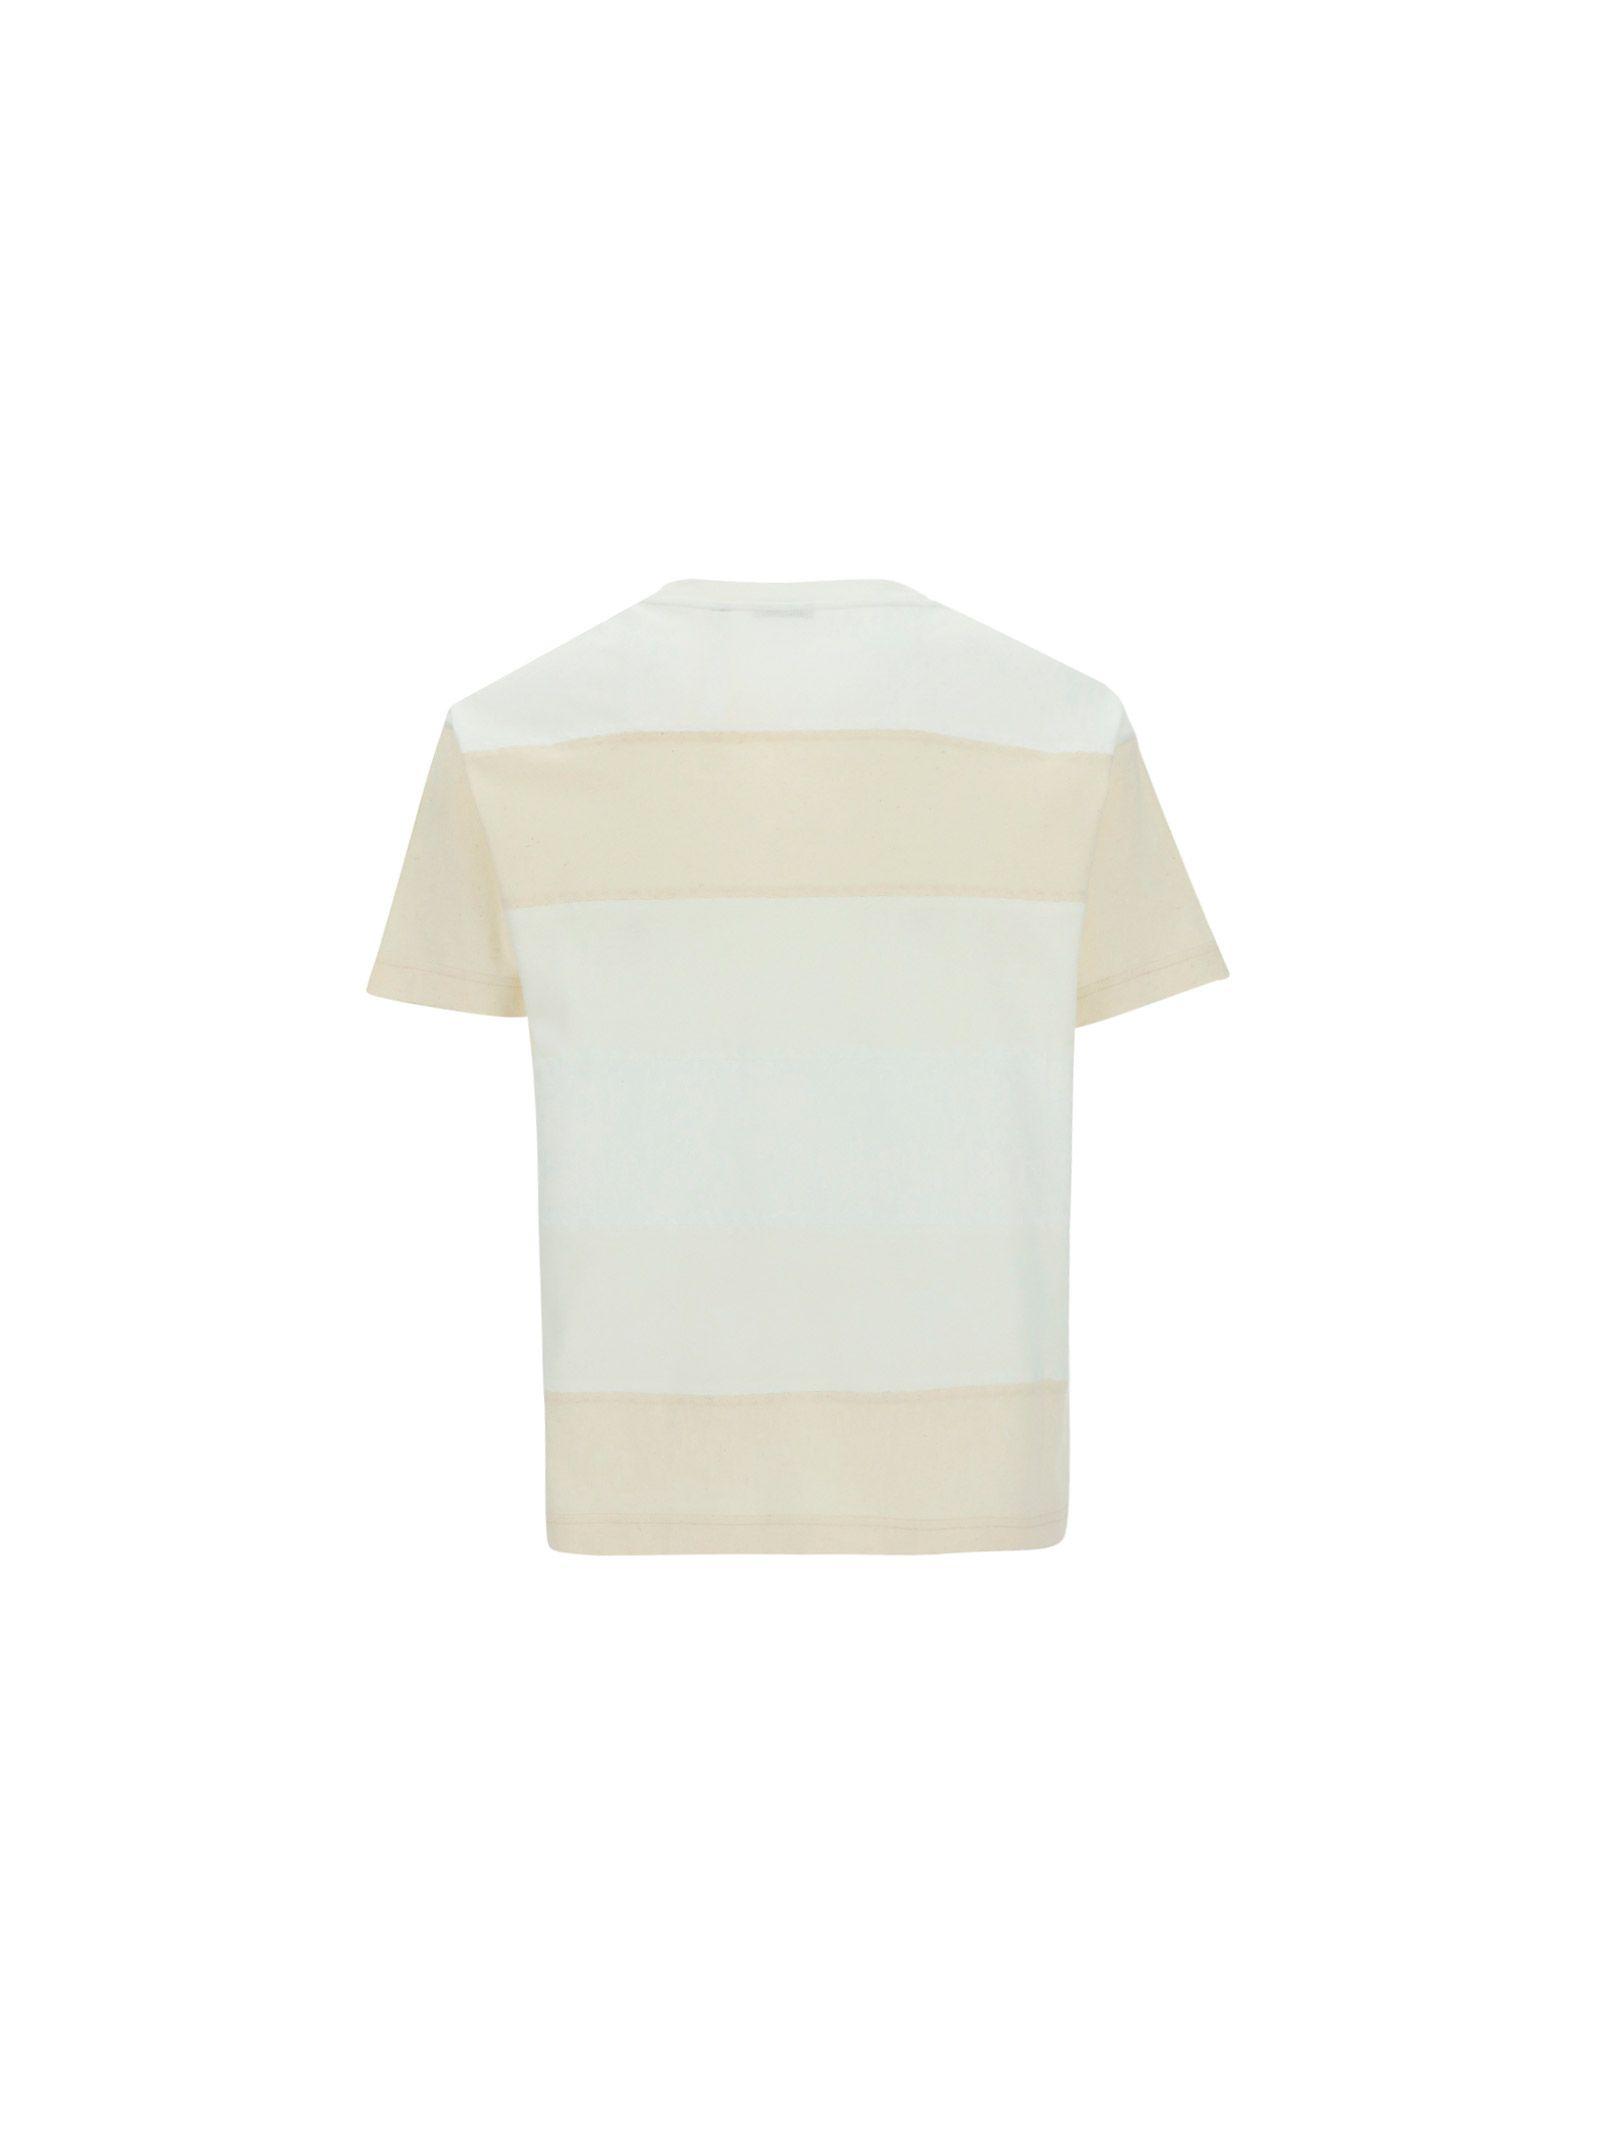 MONCLER Cottons MONCLER MEN'S WHITE OTHER MATERIALS T-SHIRT